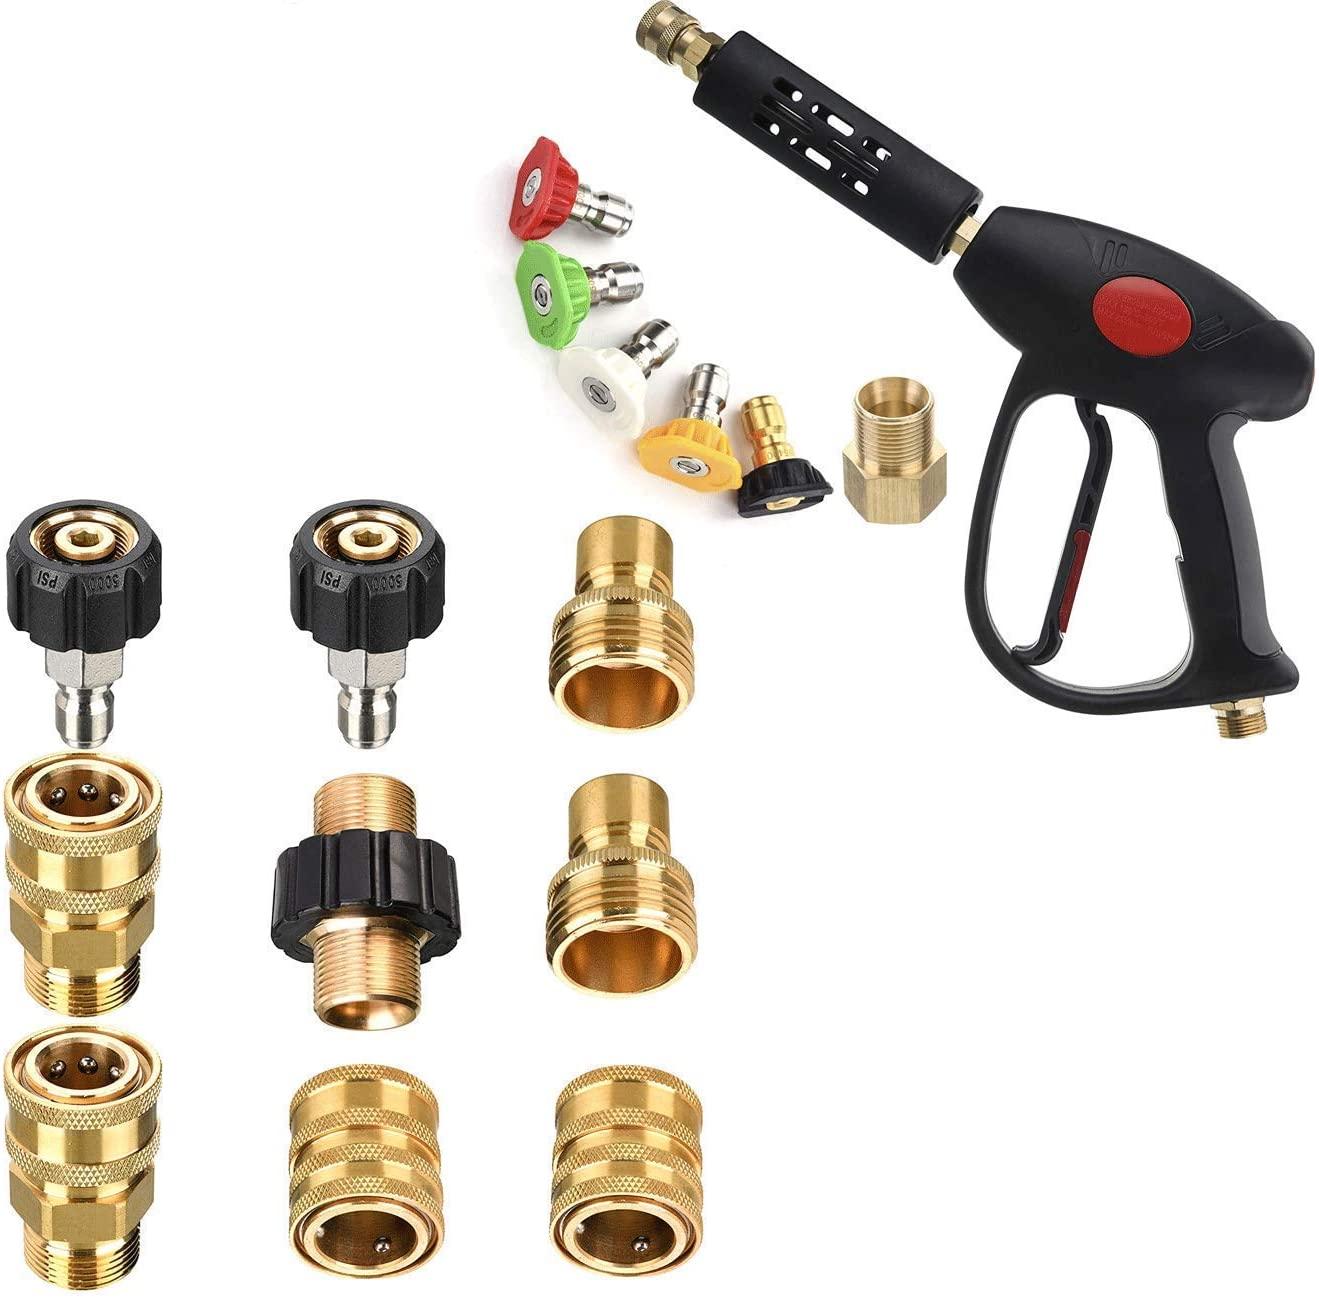 Tool Daily Pressure Washer Adapter Set, Short Pressure Washer Gun, M22